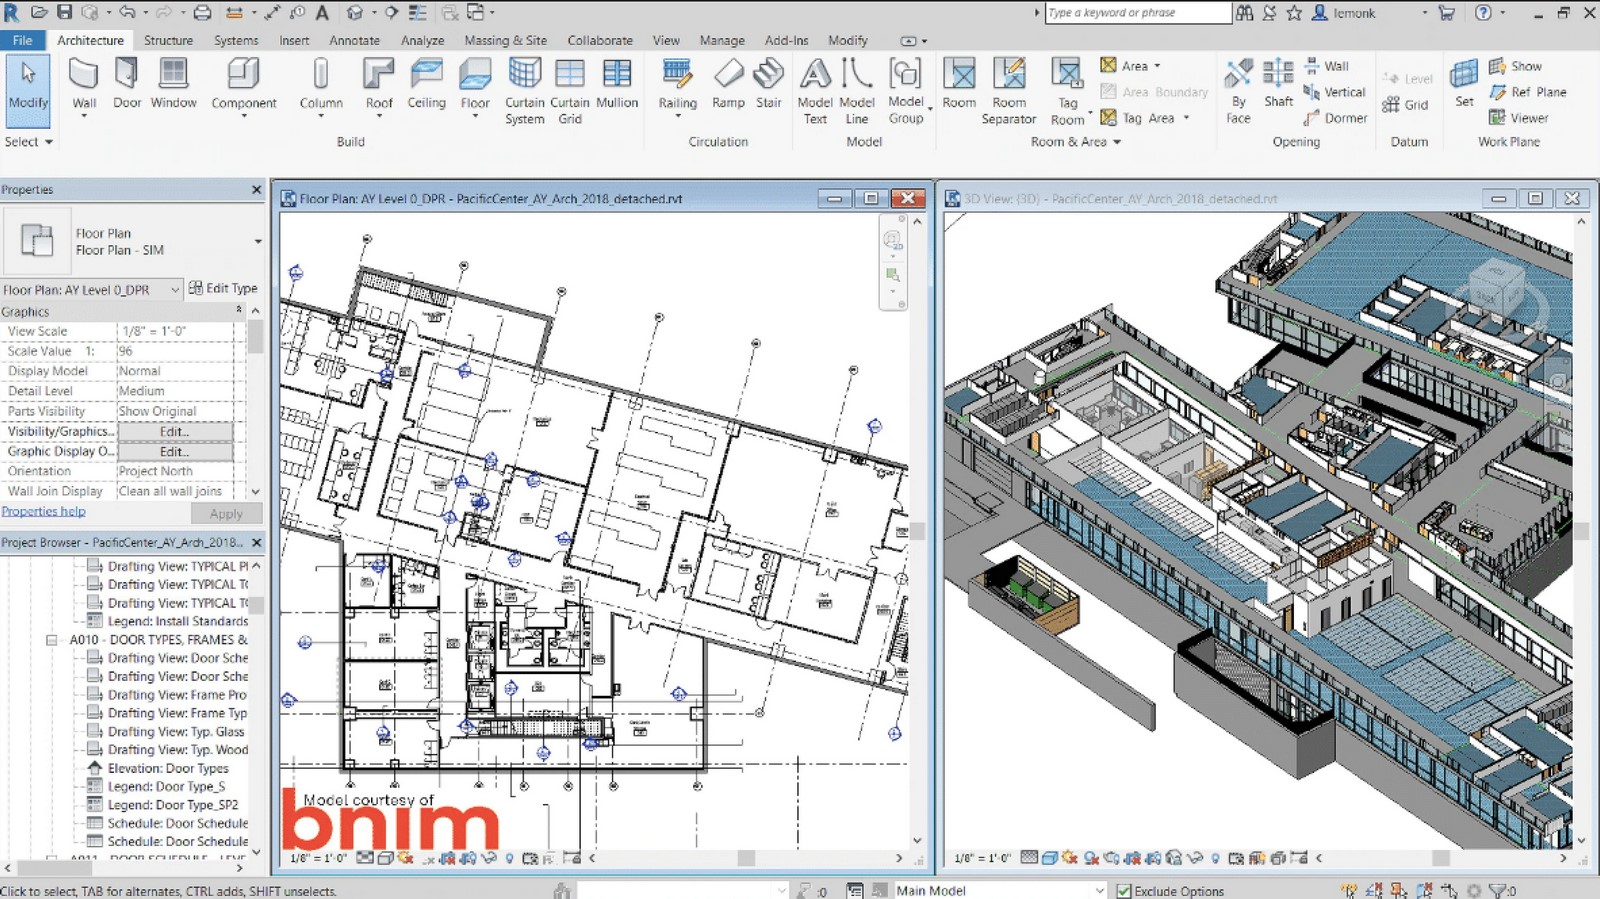 Autodesk Revit - Sheet1